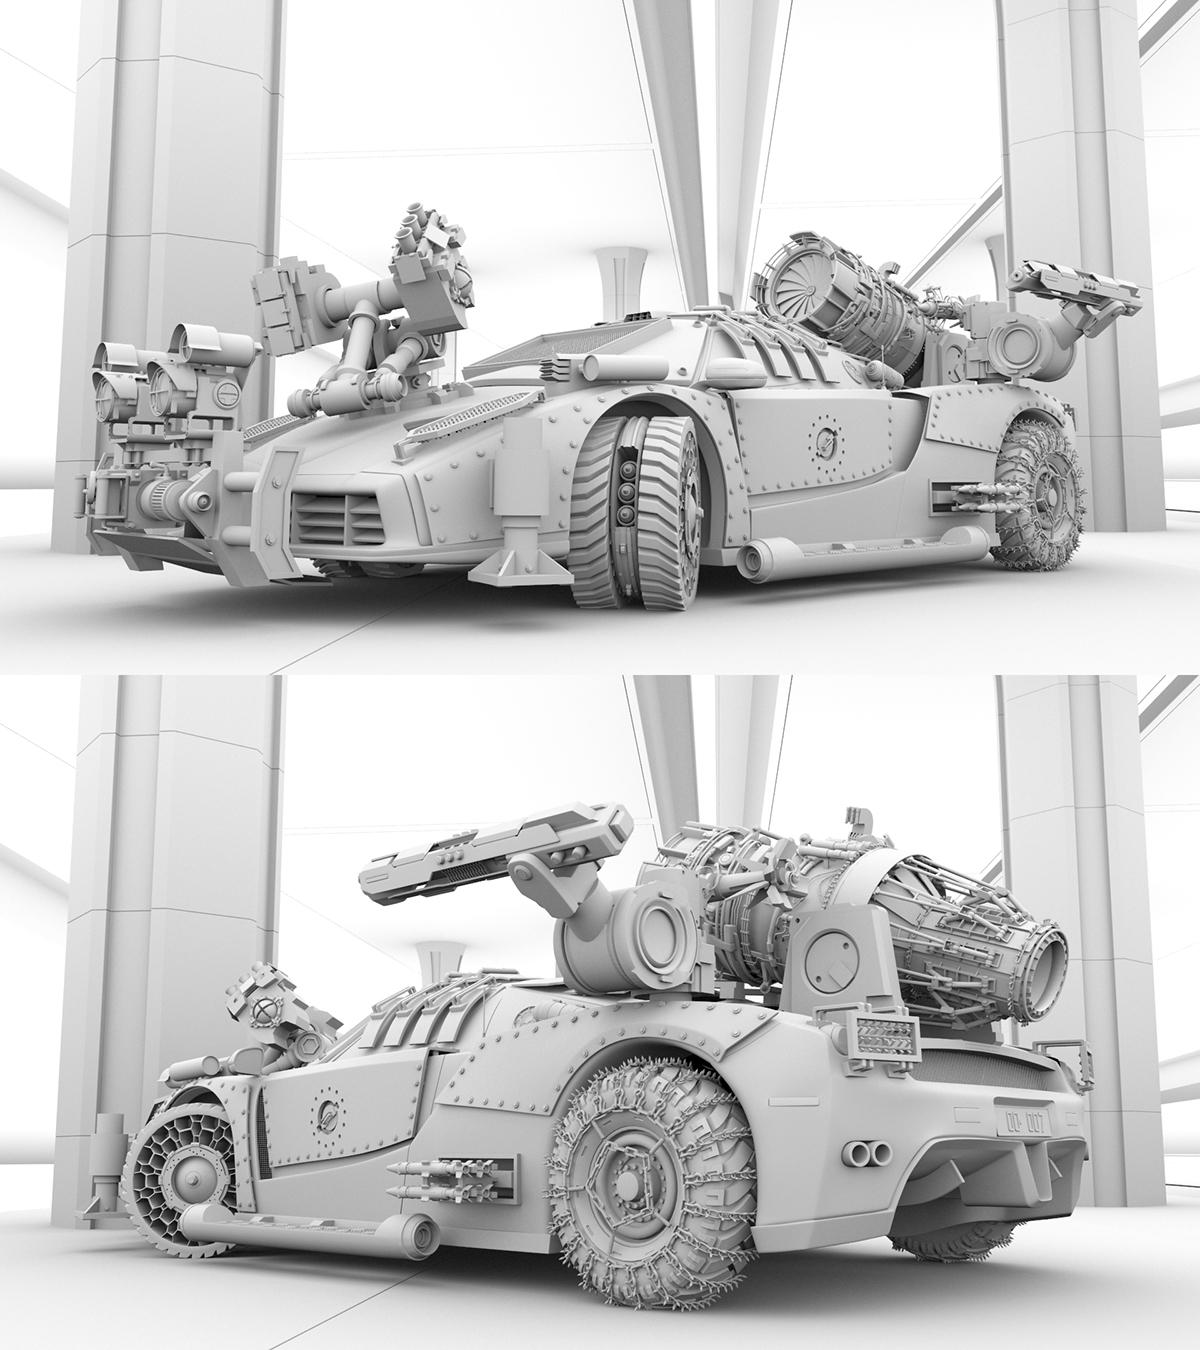 Zombie Killer car Zombie proof Anti Zombies v-ray for maya 3D APA Member Pantone Canvas The National Design AIGA member SAIC